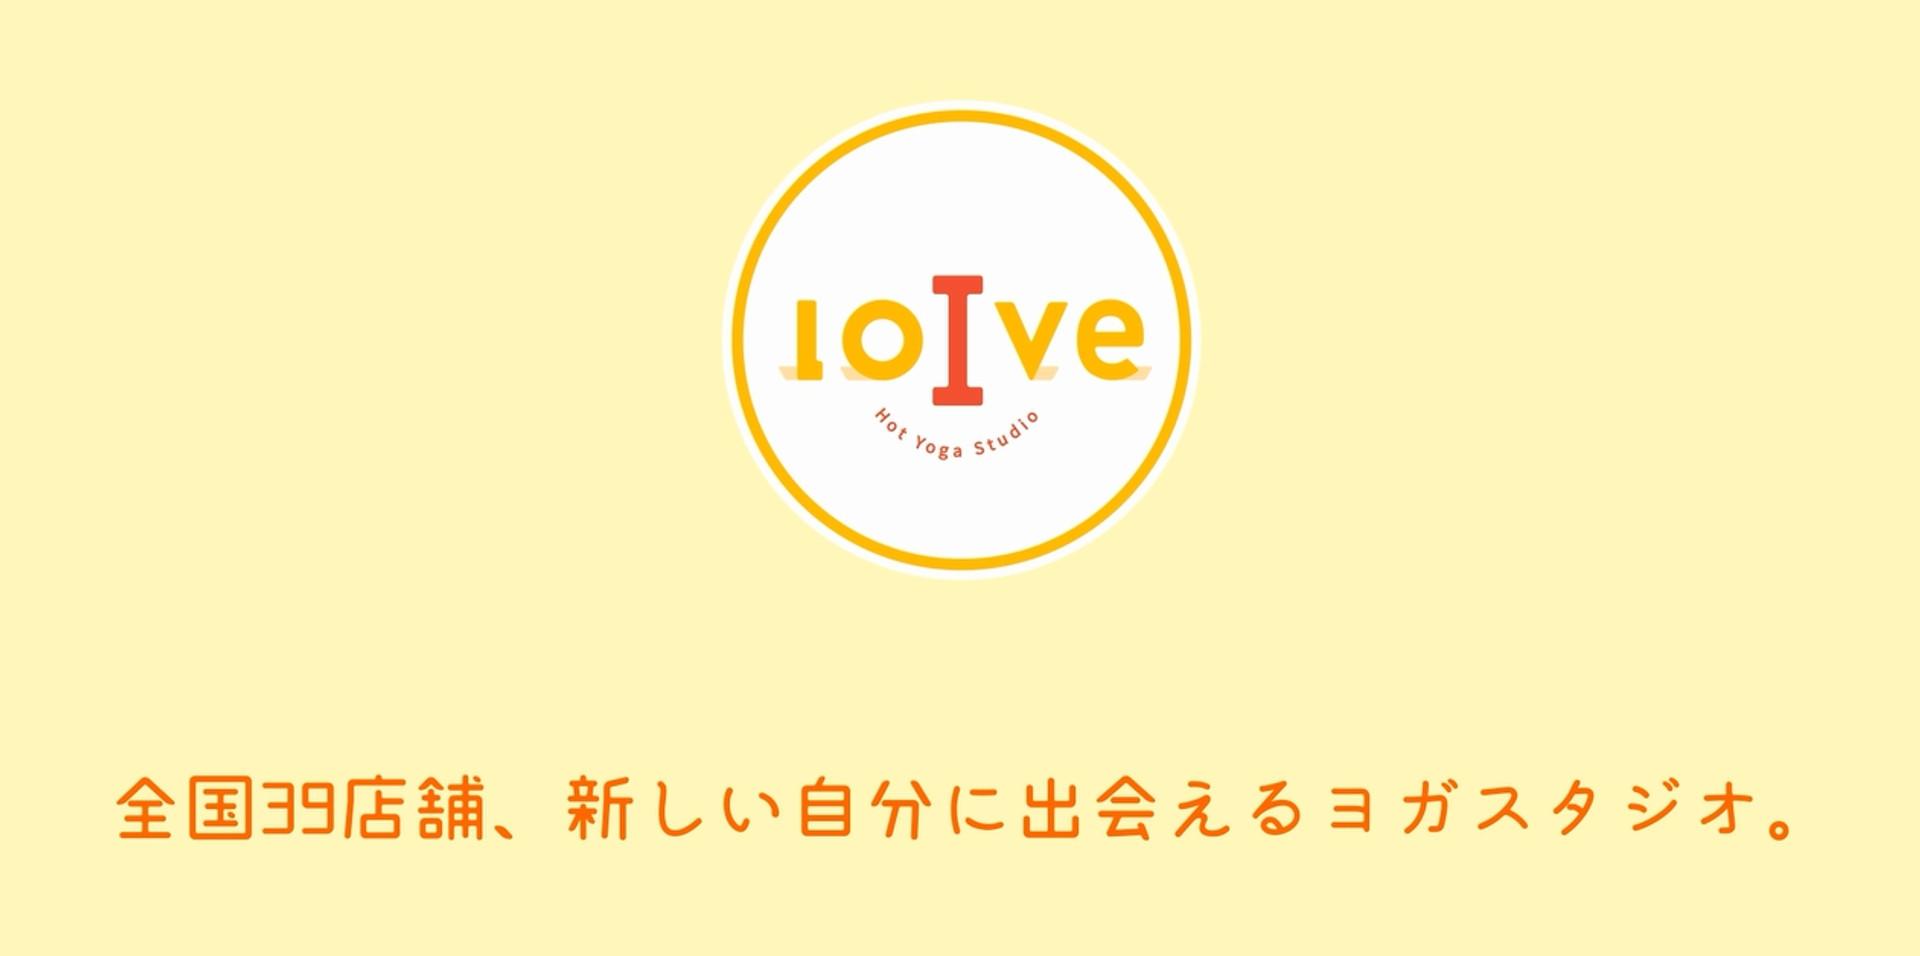 『loIve』2019